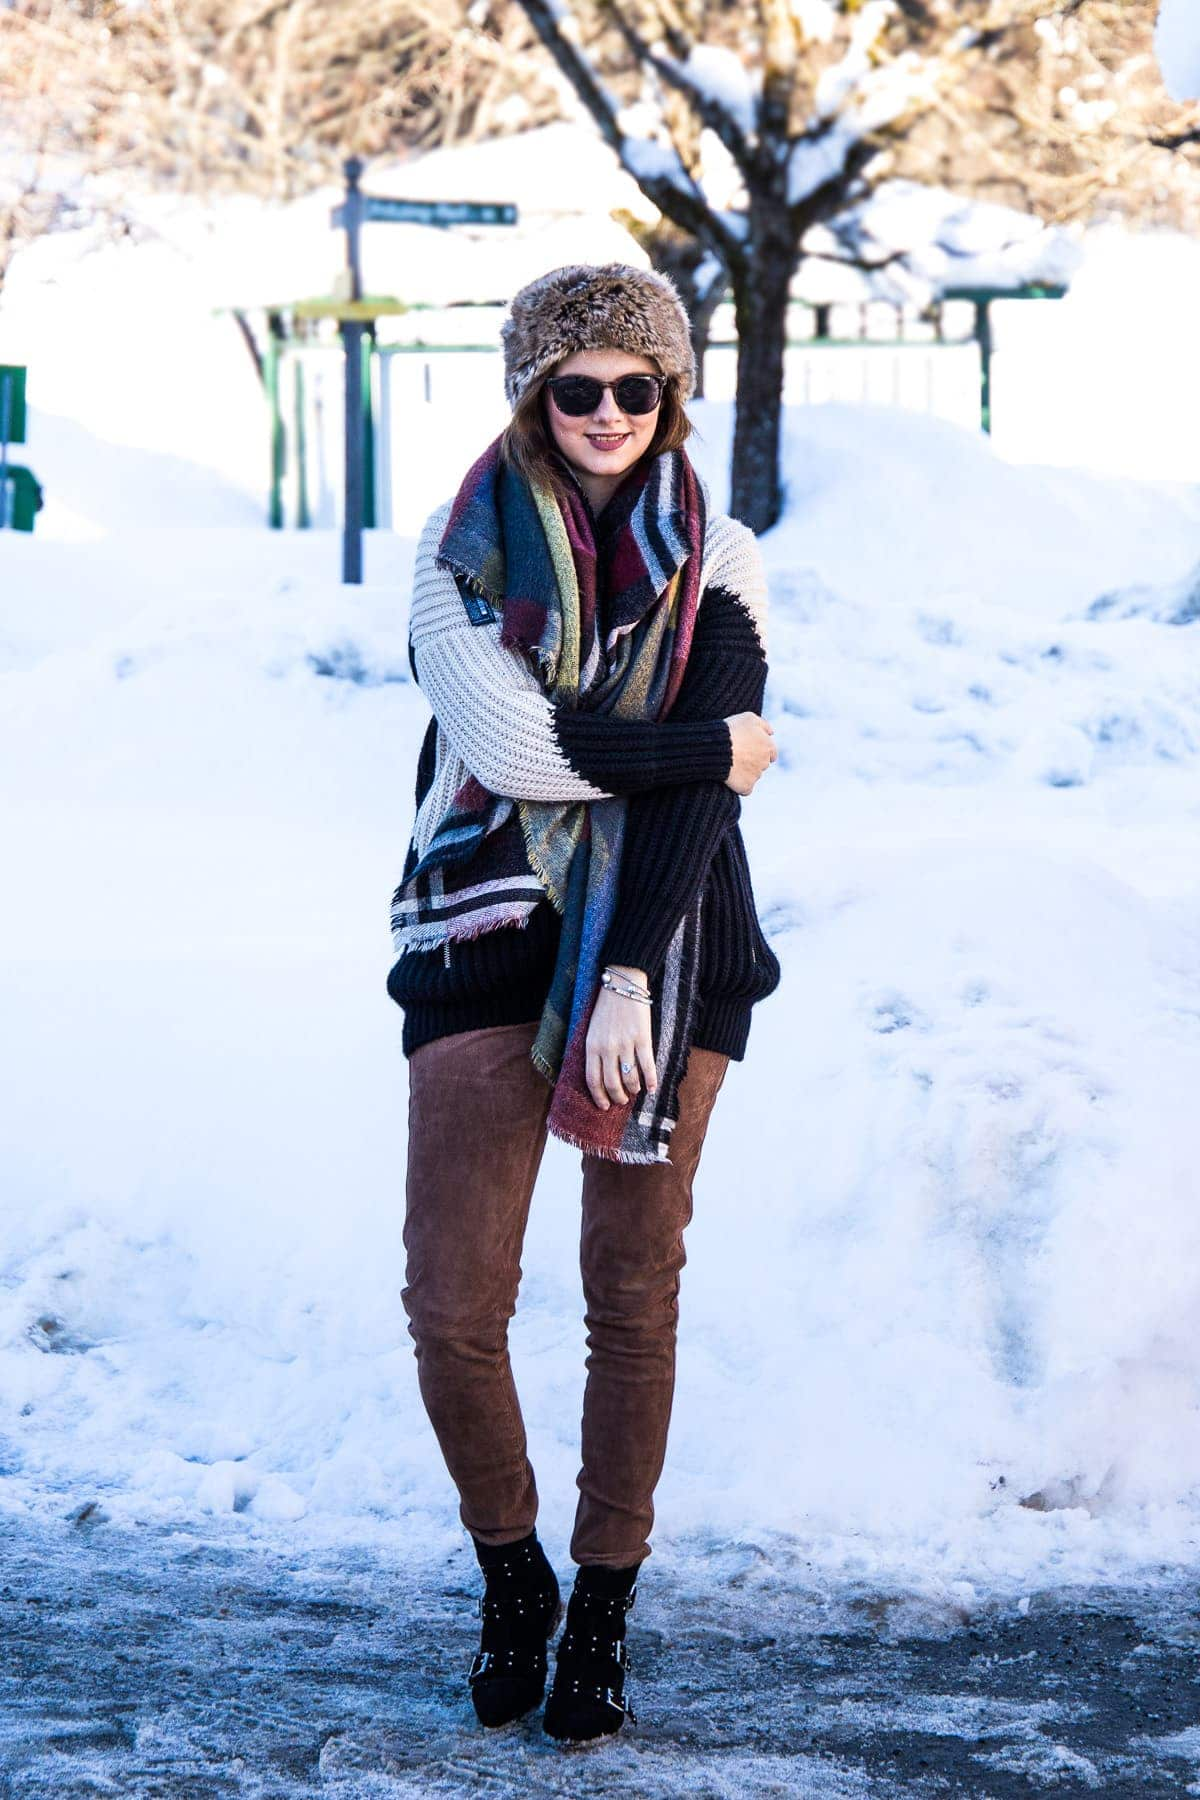 Outfit – Maje Cardigan, Lederhose & Isabel Marant Look-a-Like Boots